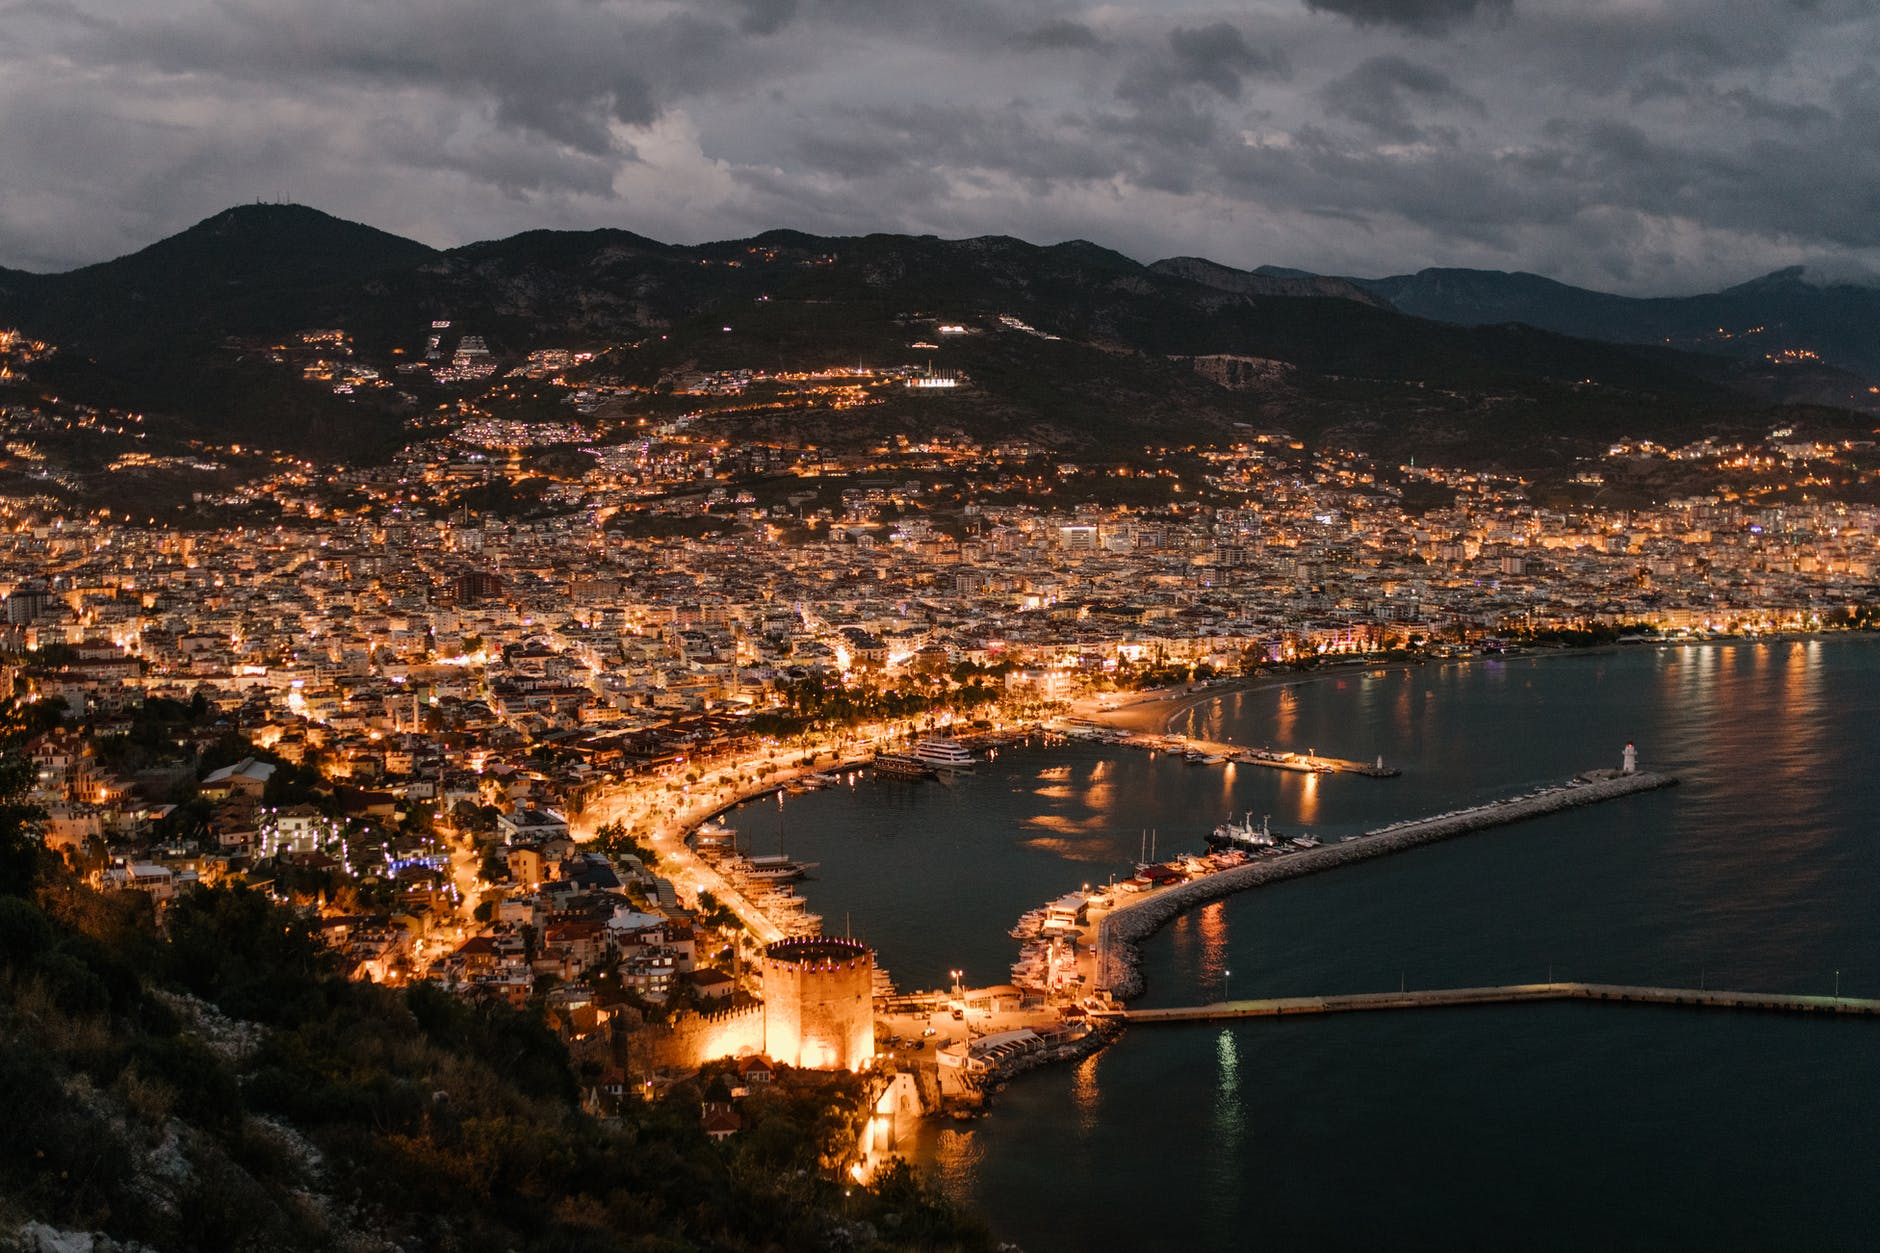 picturesque scenery of coastal town in night illumination